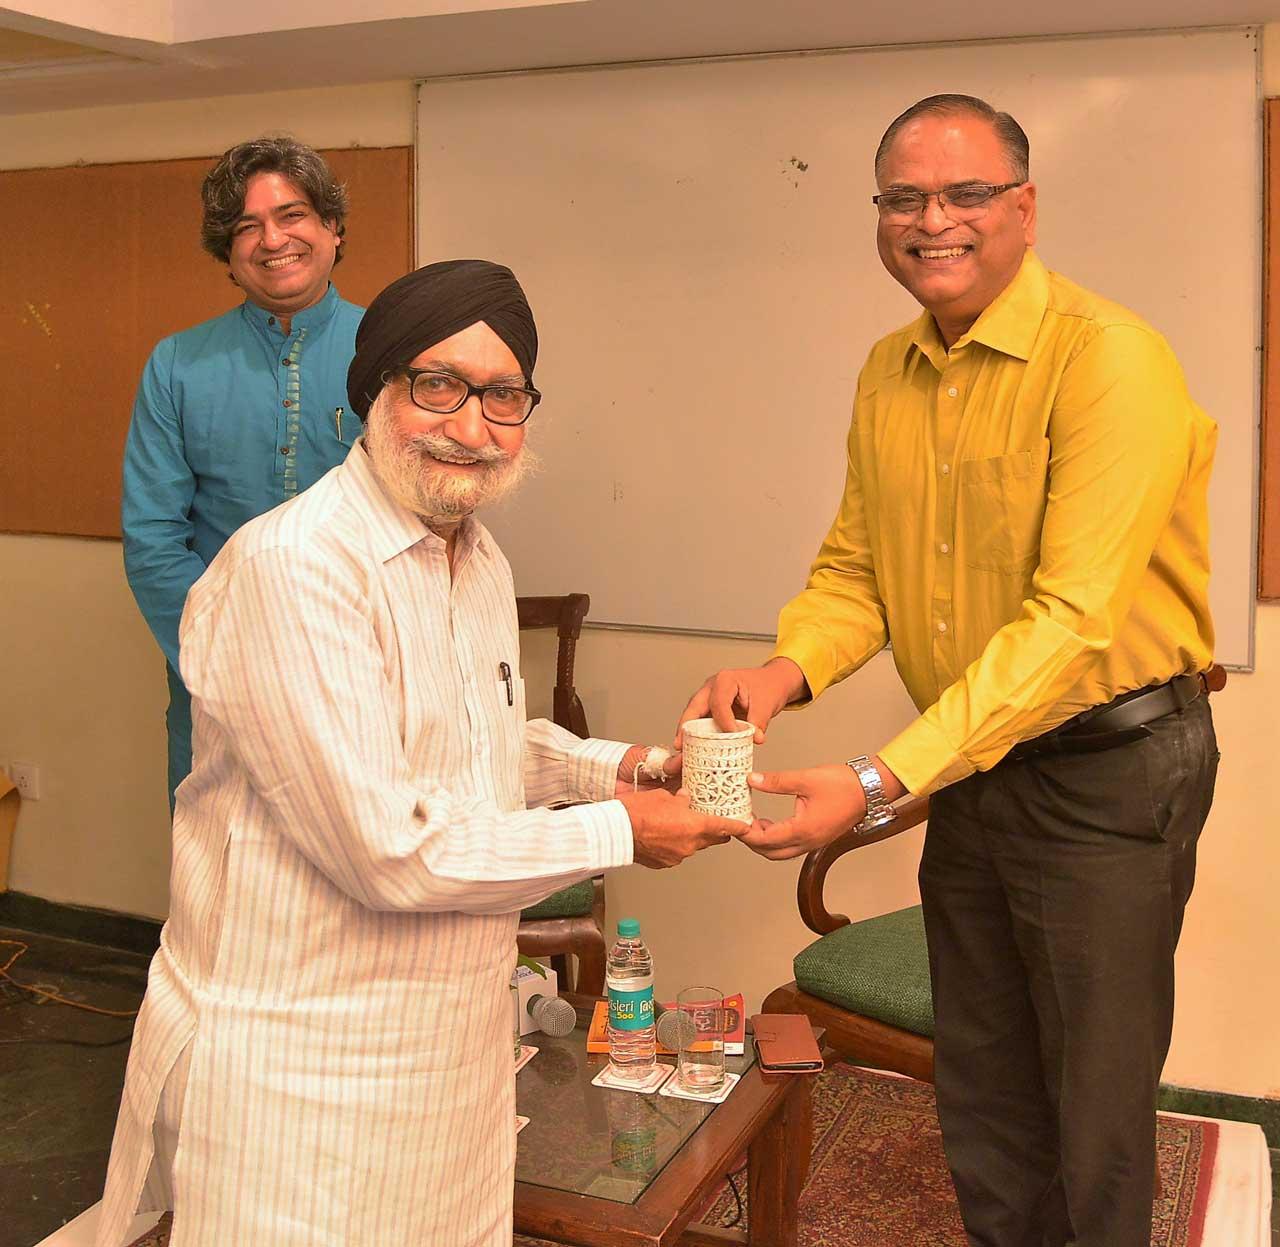 Memento-Presentation-by-Bakshish-Singh-to-Anant-Bhatnagar